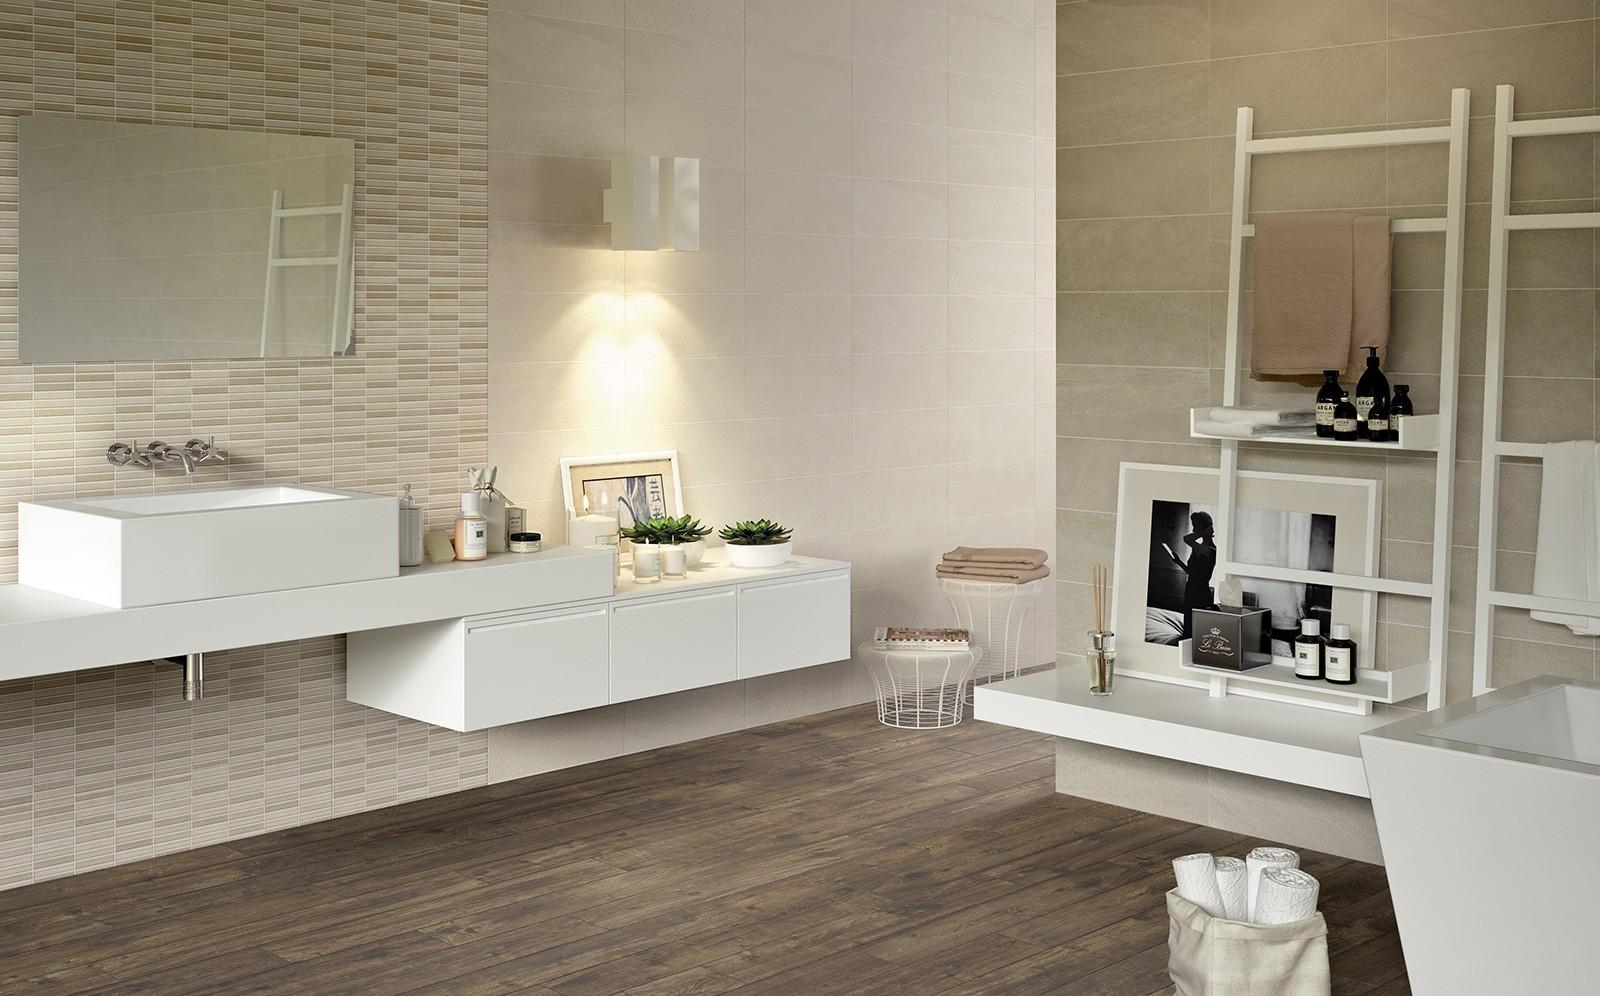 Bagno Moderno Con Mosaico ~ FaTuA.NeT for .